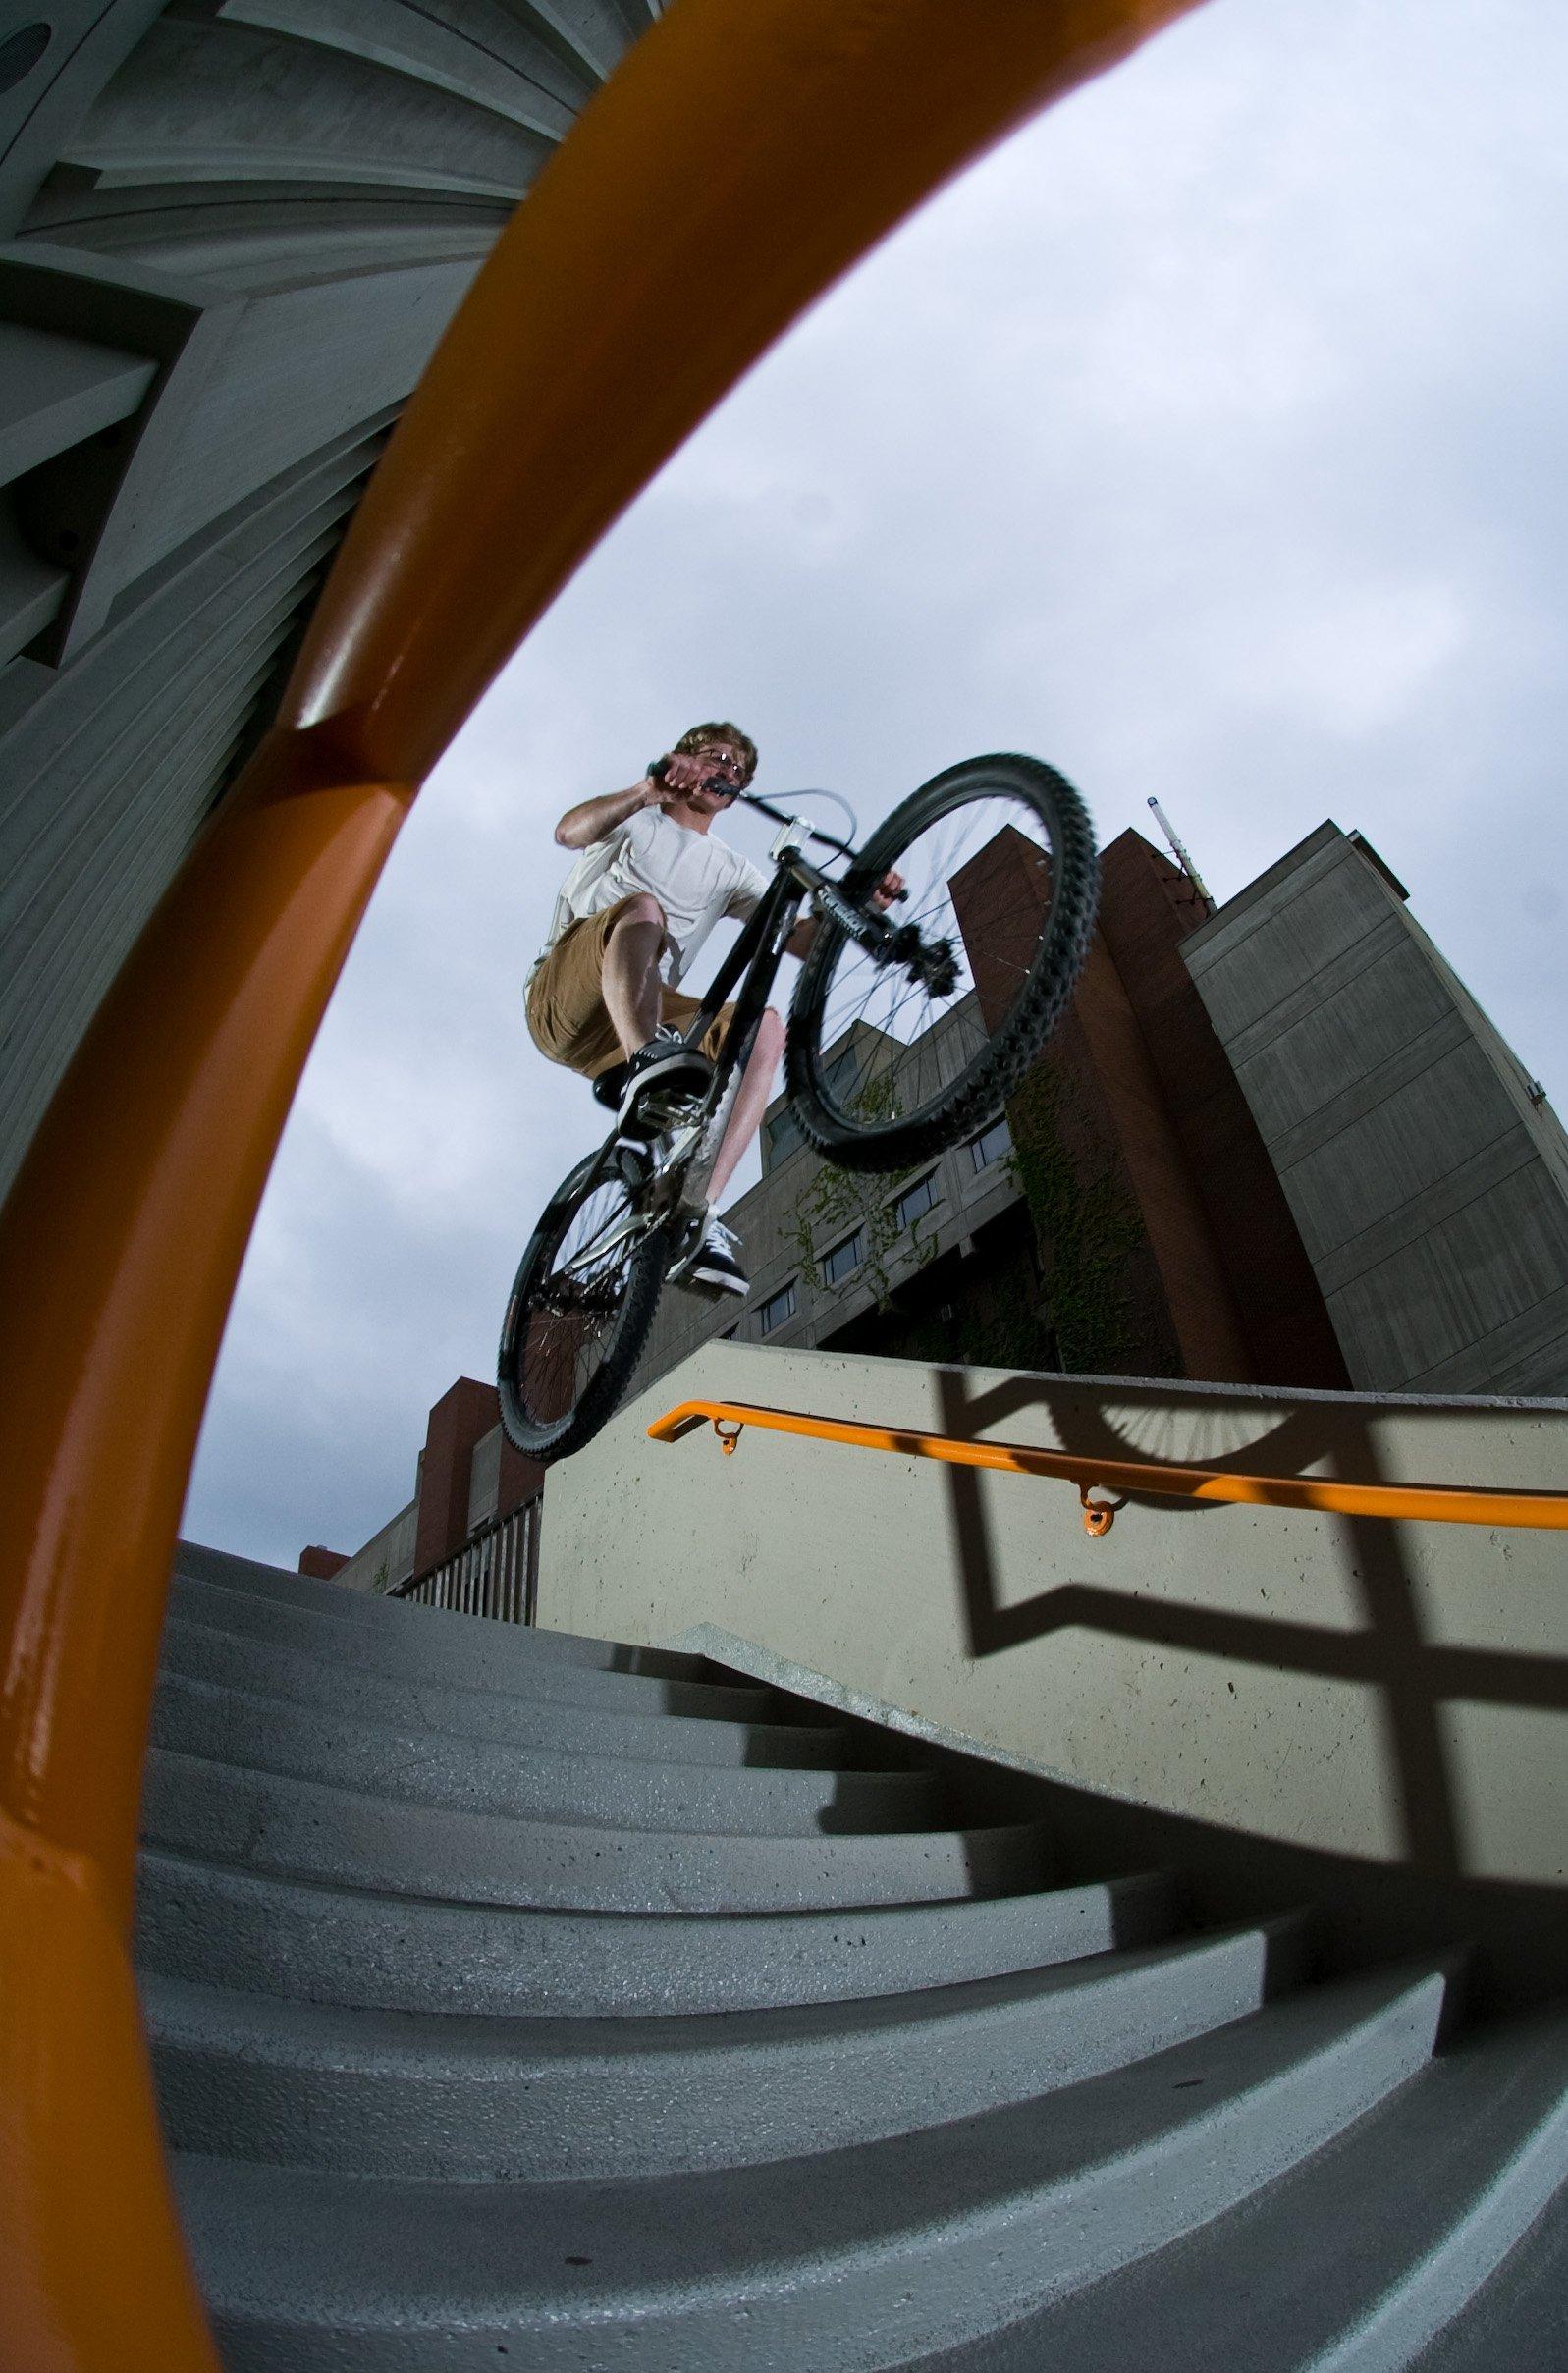 Stair Set - 2 of 2